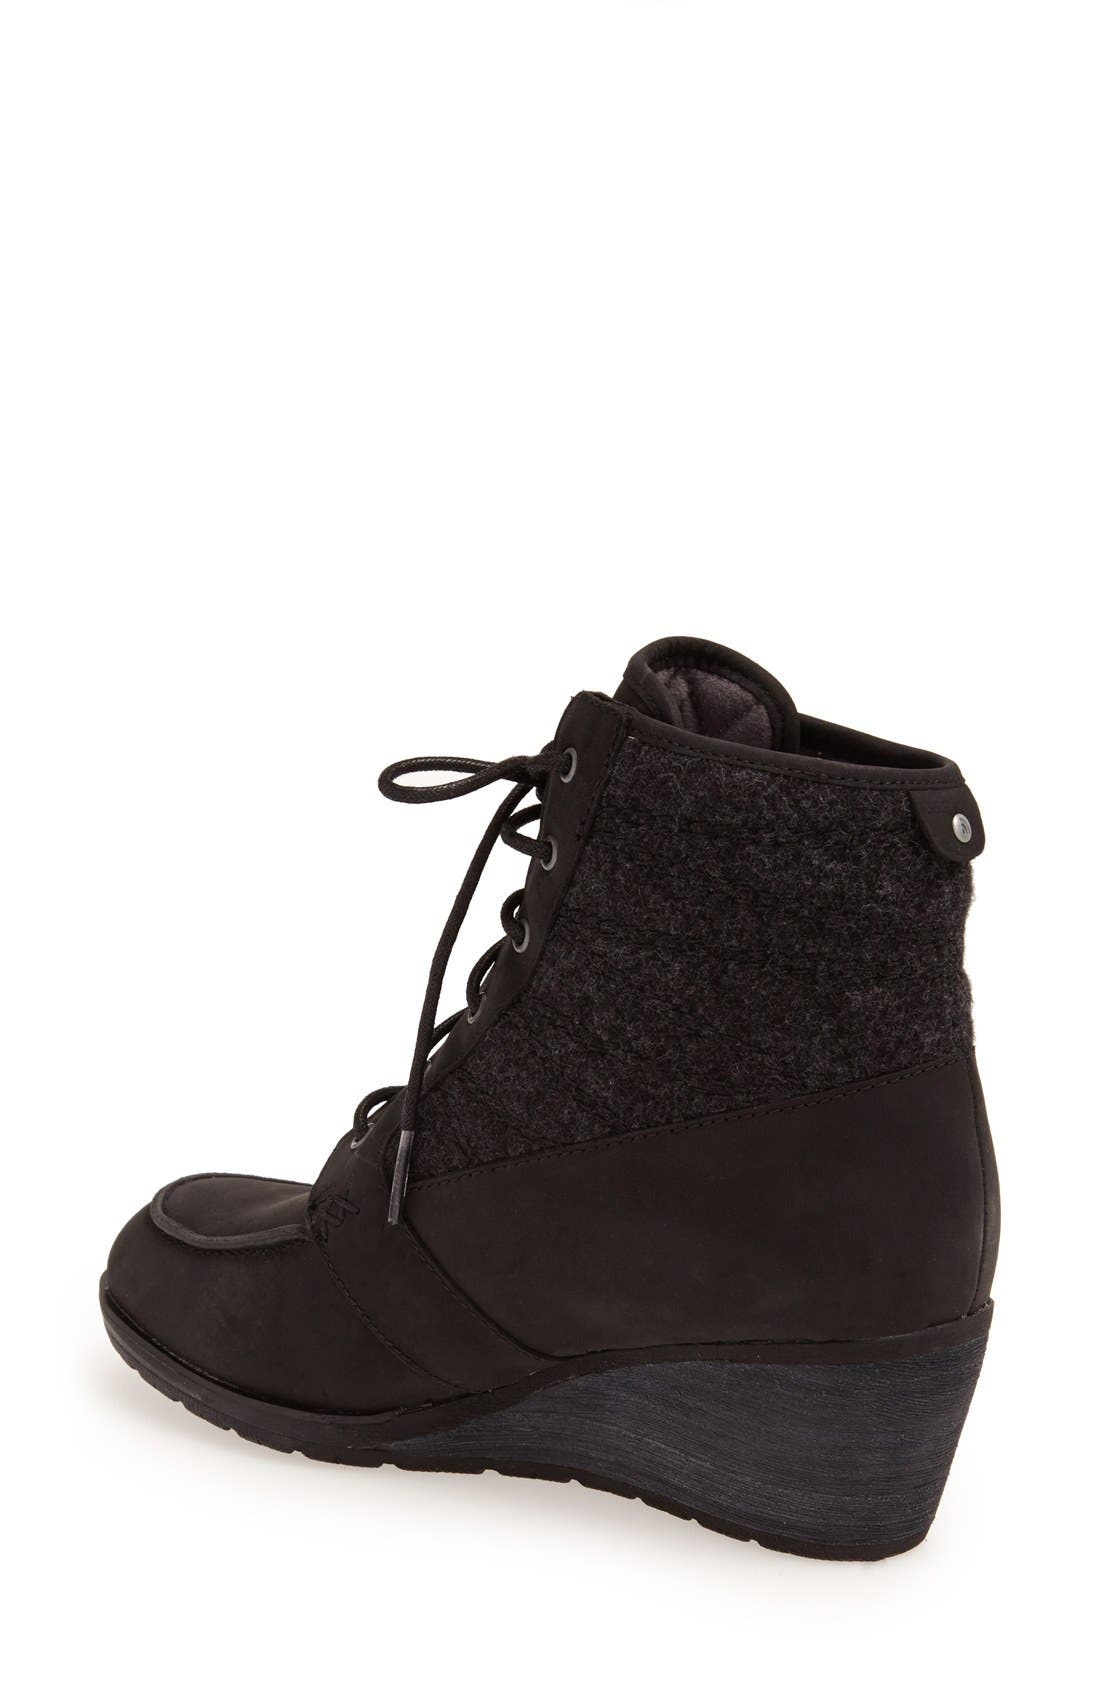 'Bridgeton Wedge Lace' Waterproof Boot,                             Alternate thumbnail 3, color,                             001